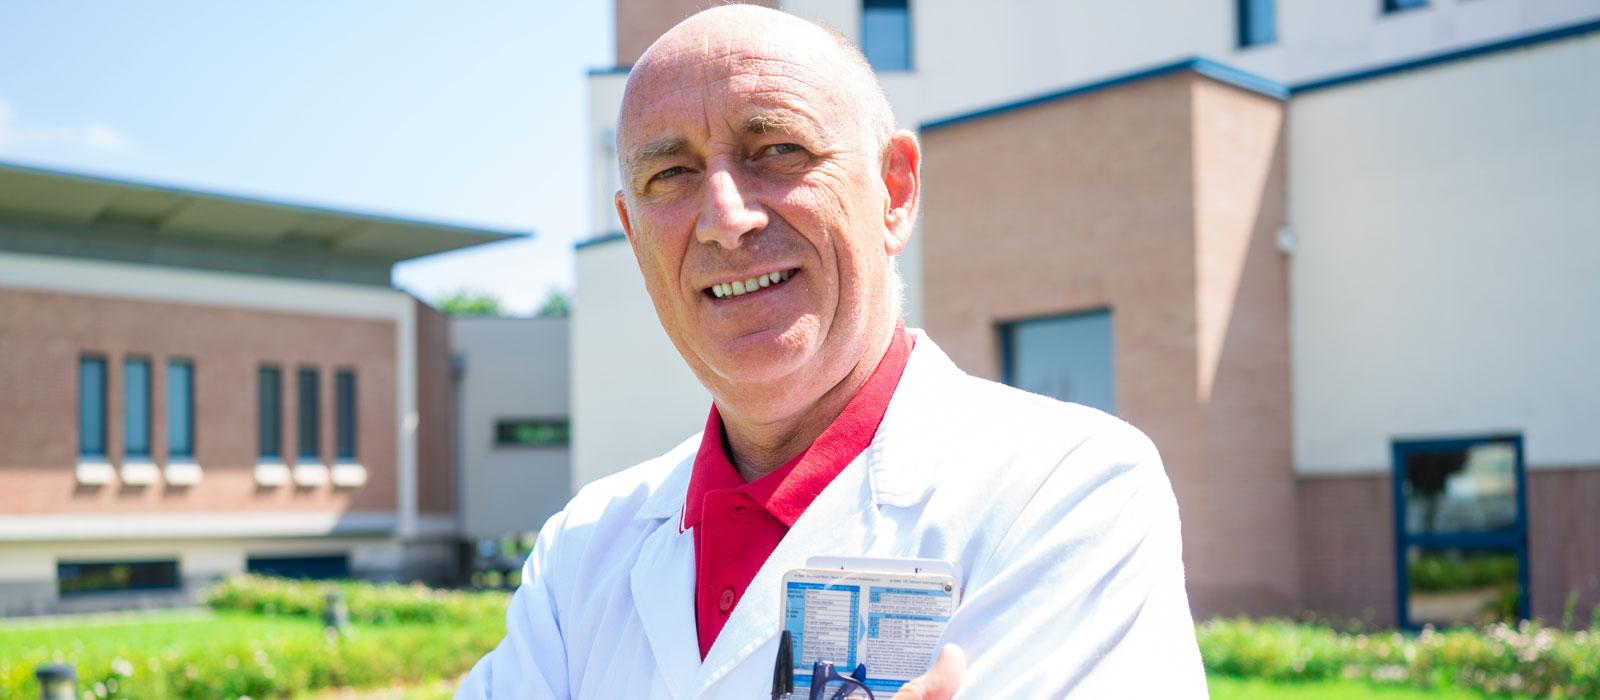 professore-neurologo-fabio-antonaci-medicina-cefalee-fondazione-mondino-emicrania-nevralgia-trigemino-5